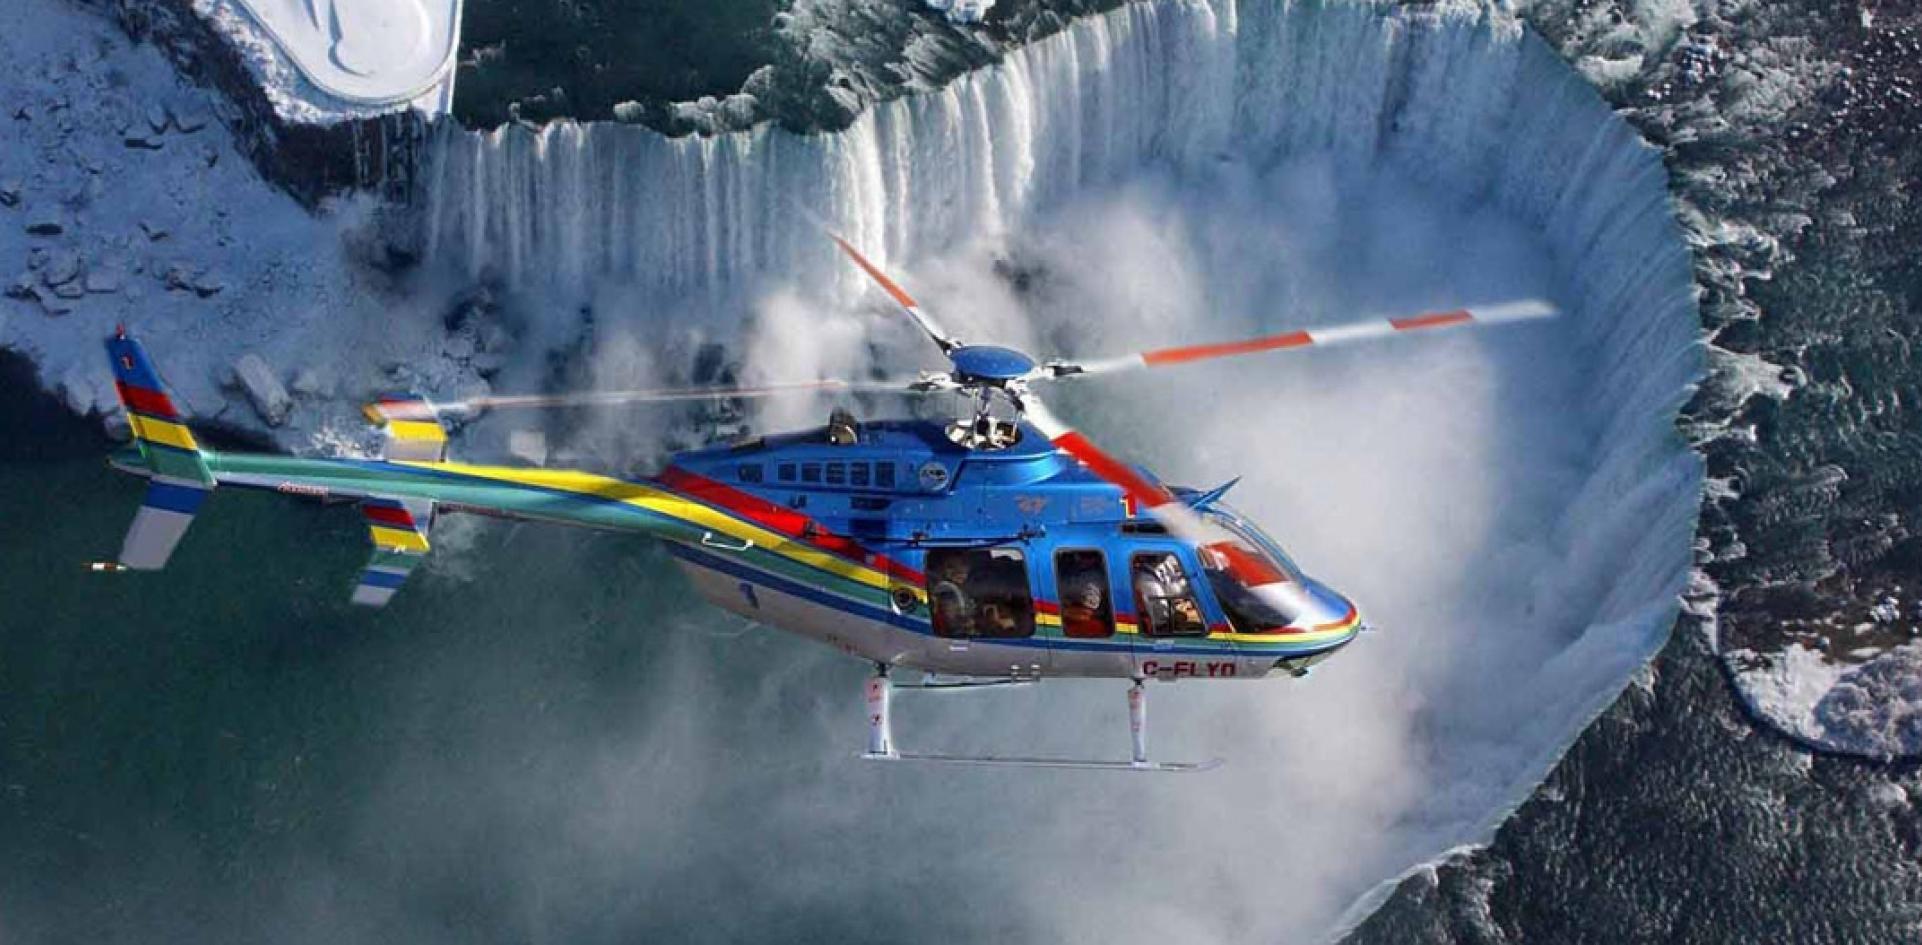 Niagara Falls Attractions – Niagara Falls Tourist Attractions Map